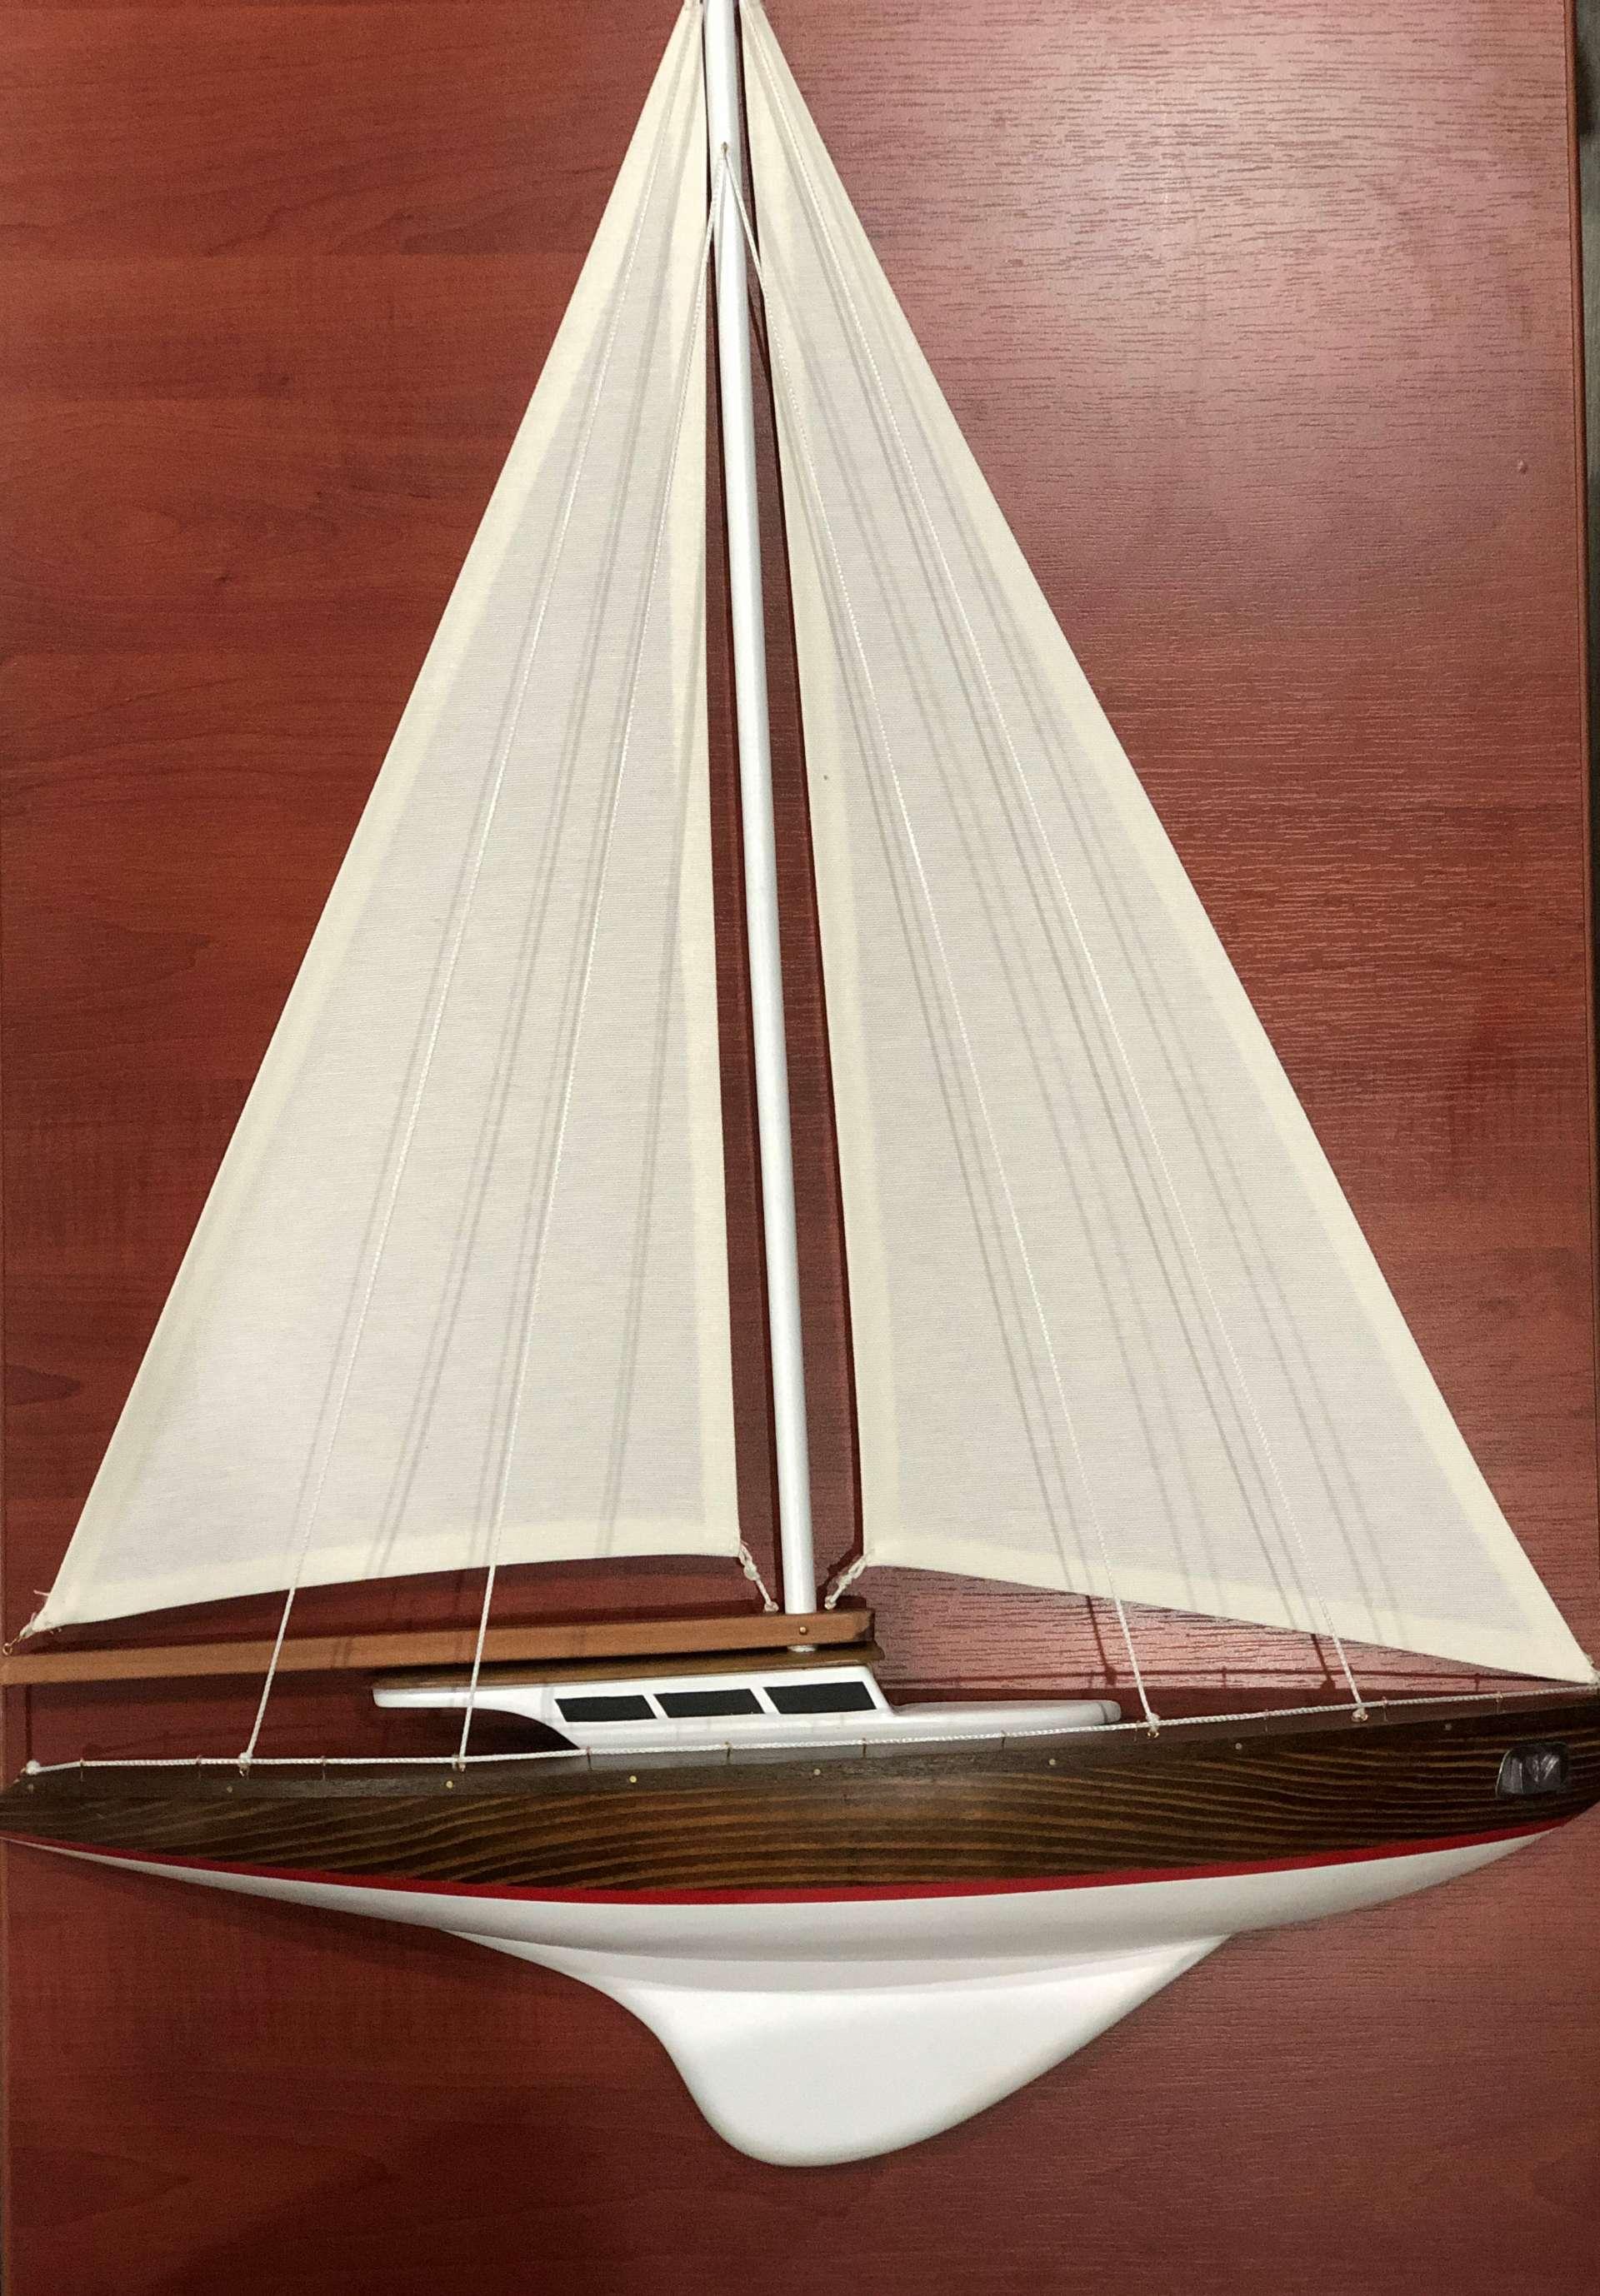 Wall Mountable Sailing Ship Model